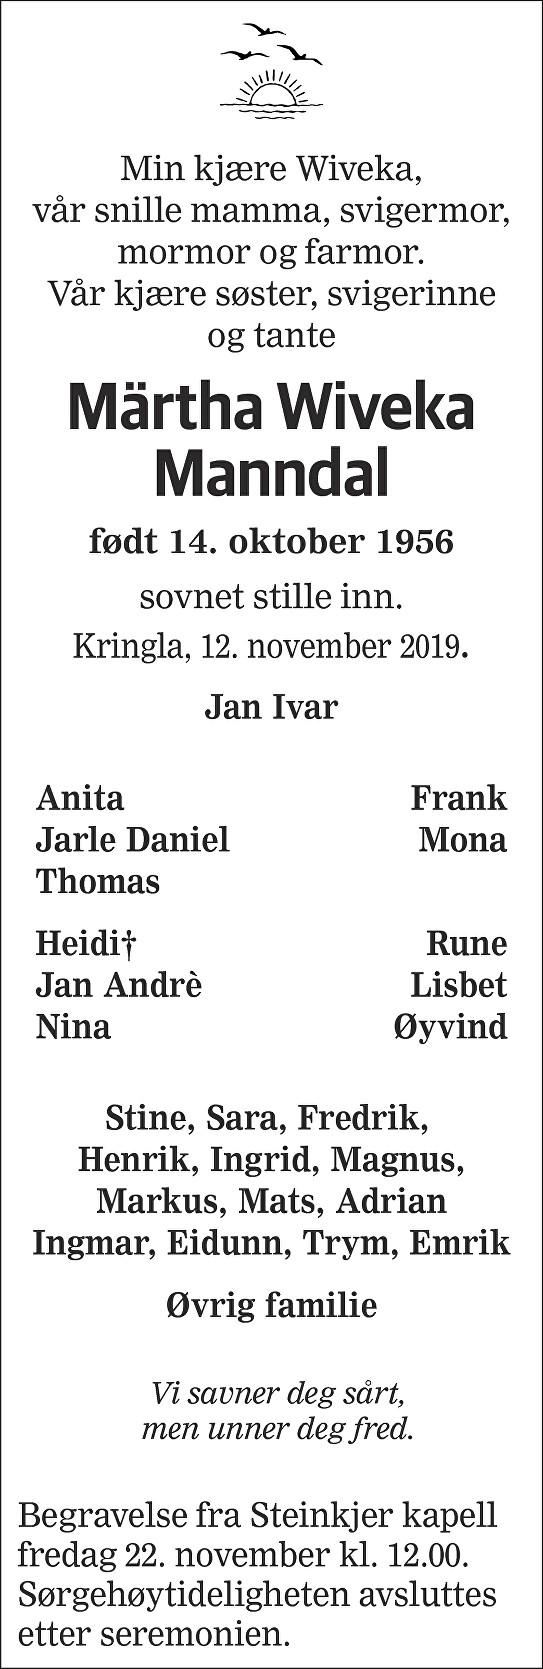 Märtha Wiveka Manndal Dødsannonse